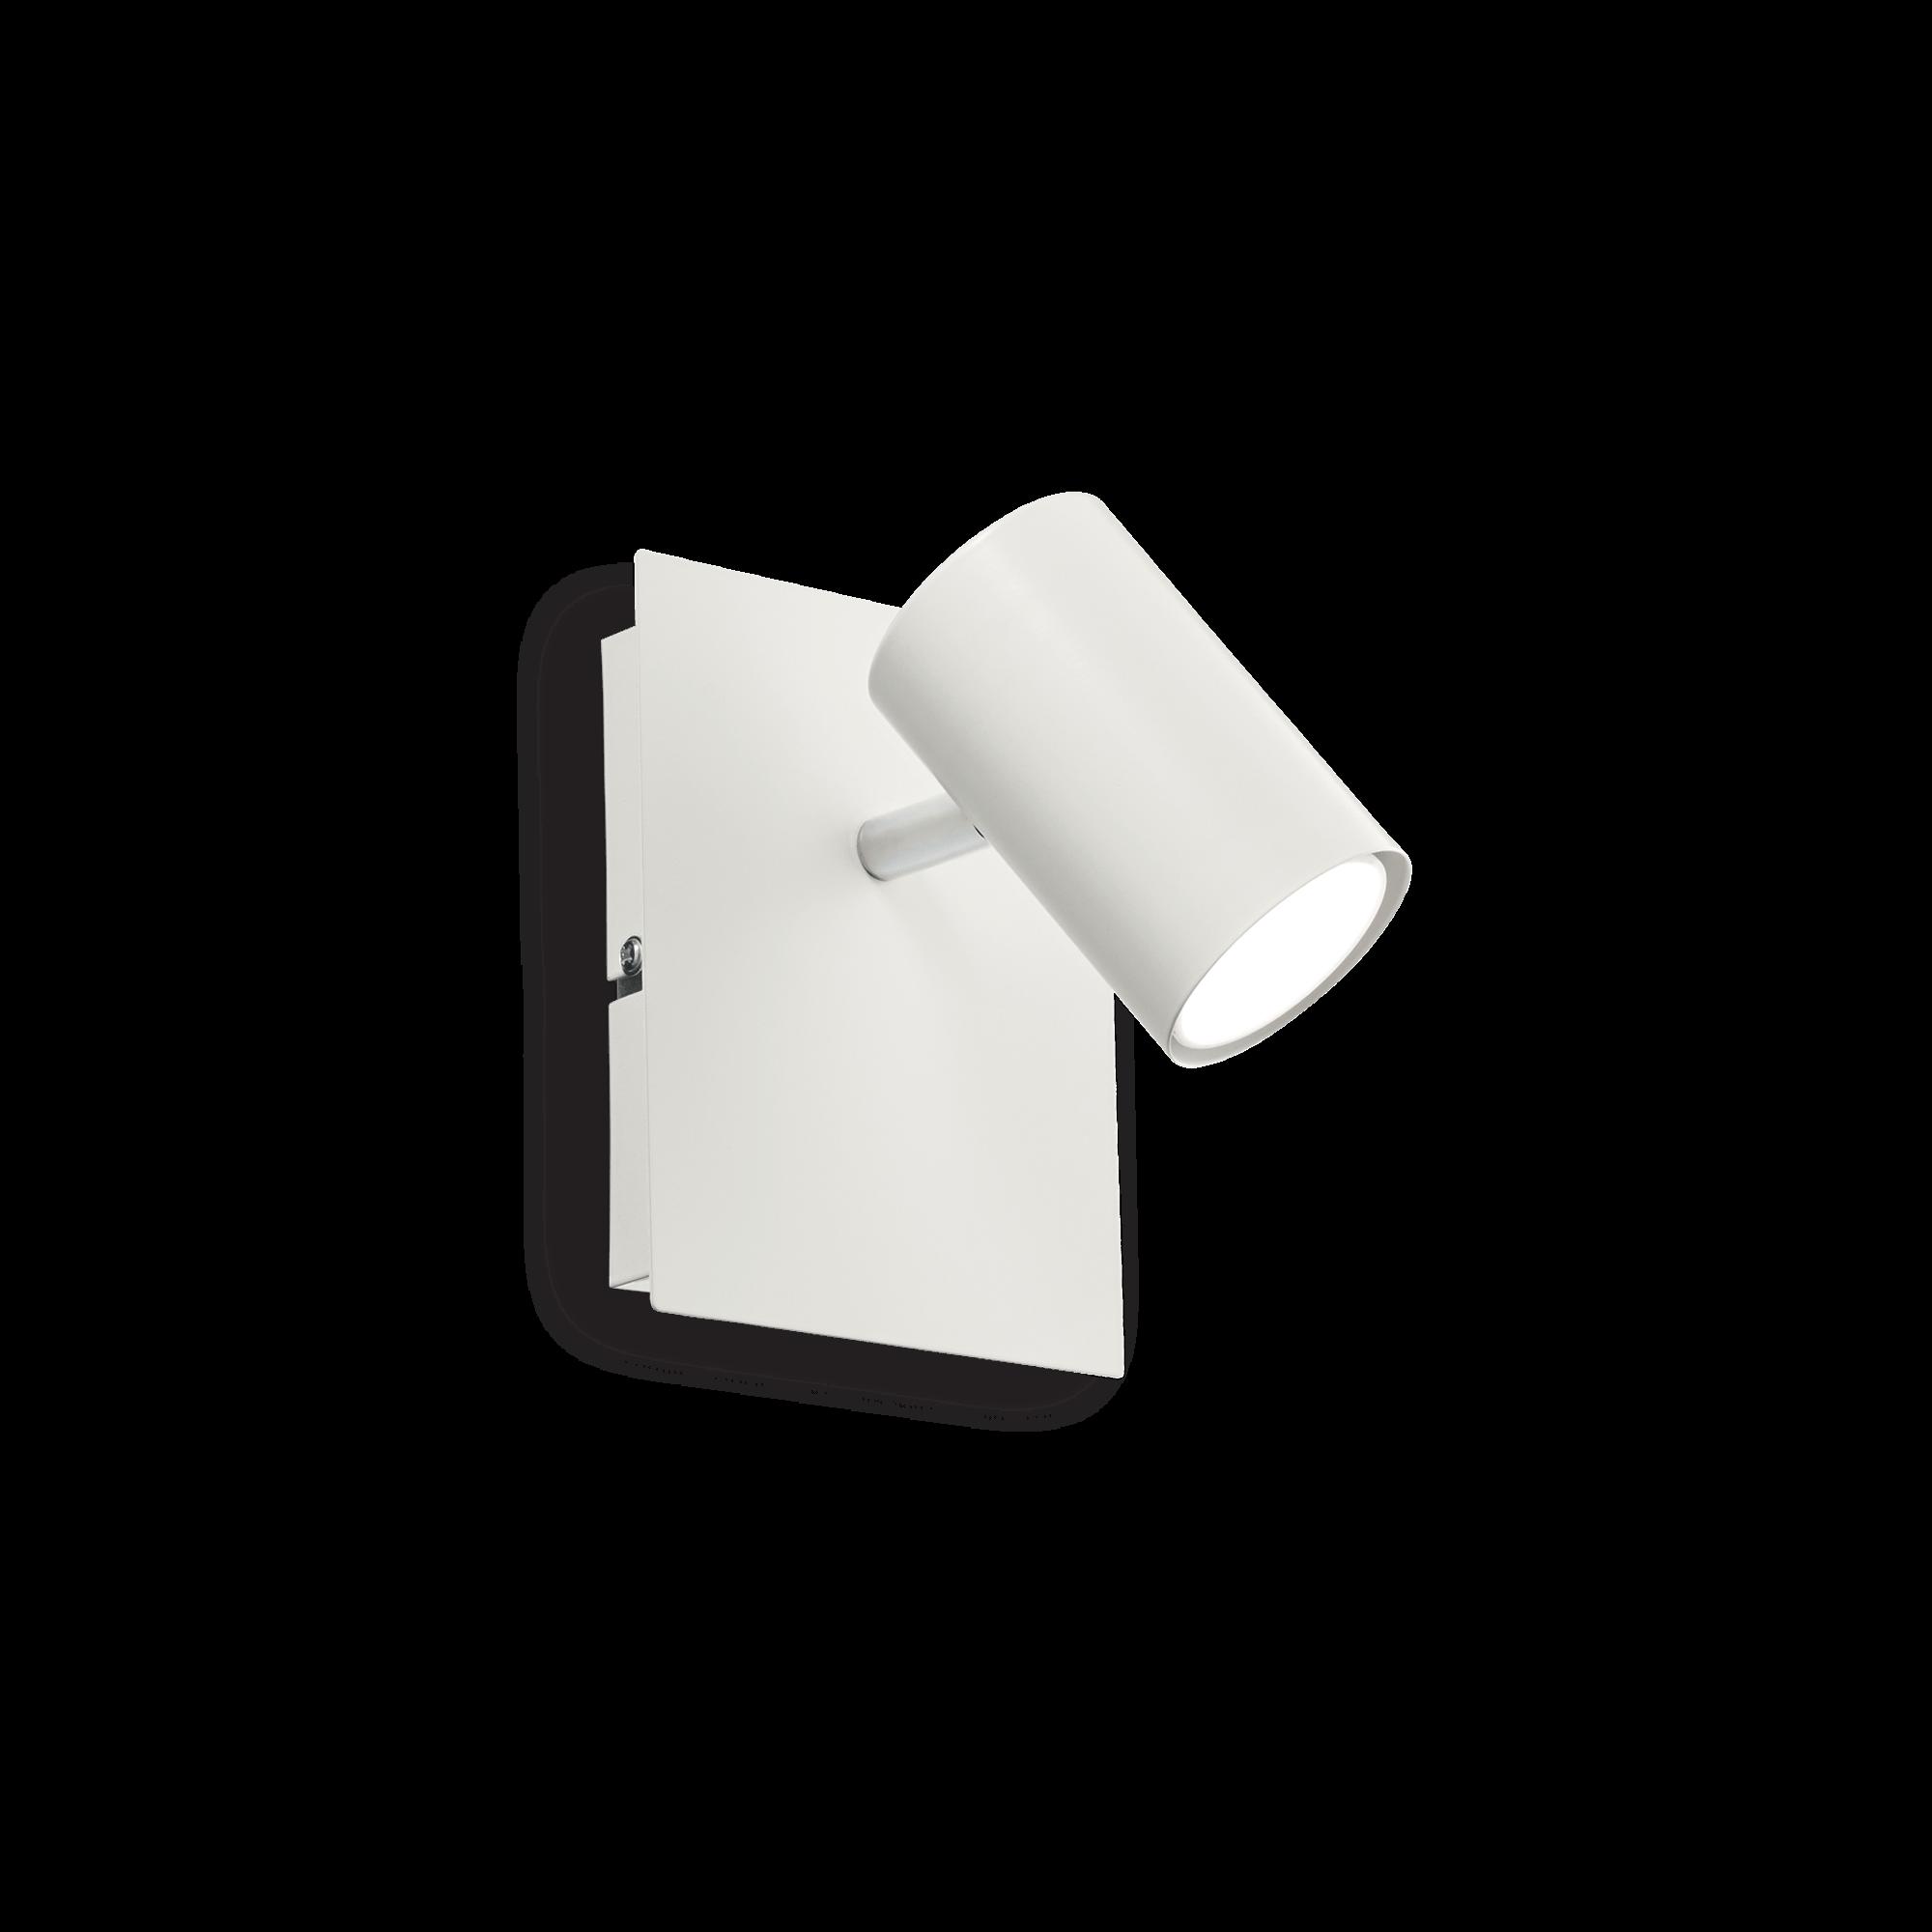 Ideal Lux 156729 SPOT AP1 BIANCO 1 izzós spot fali lámpa